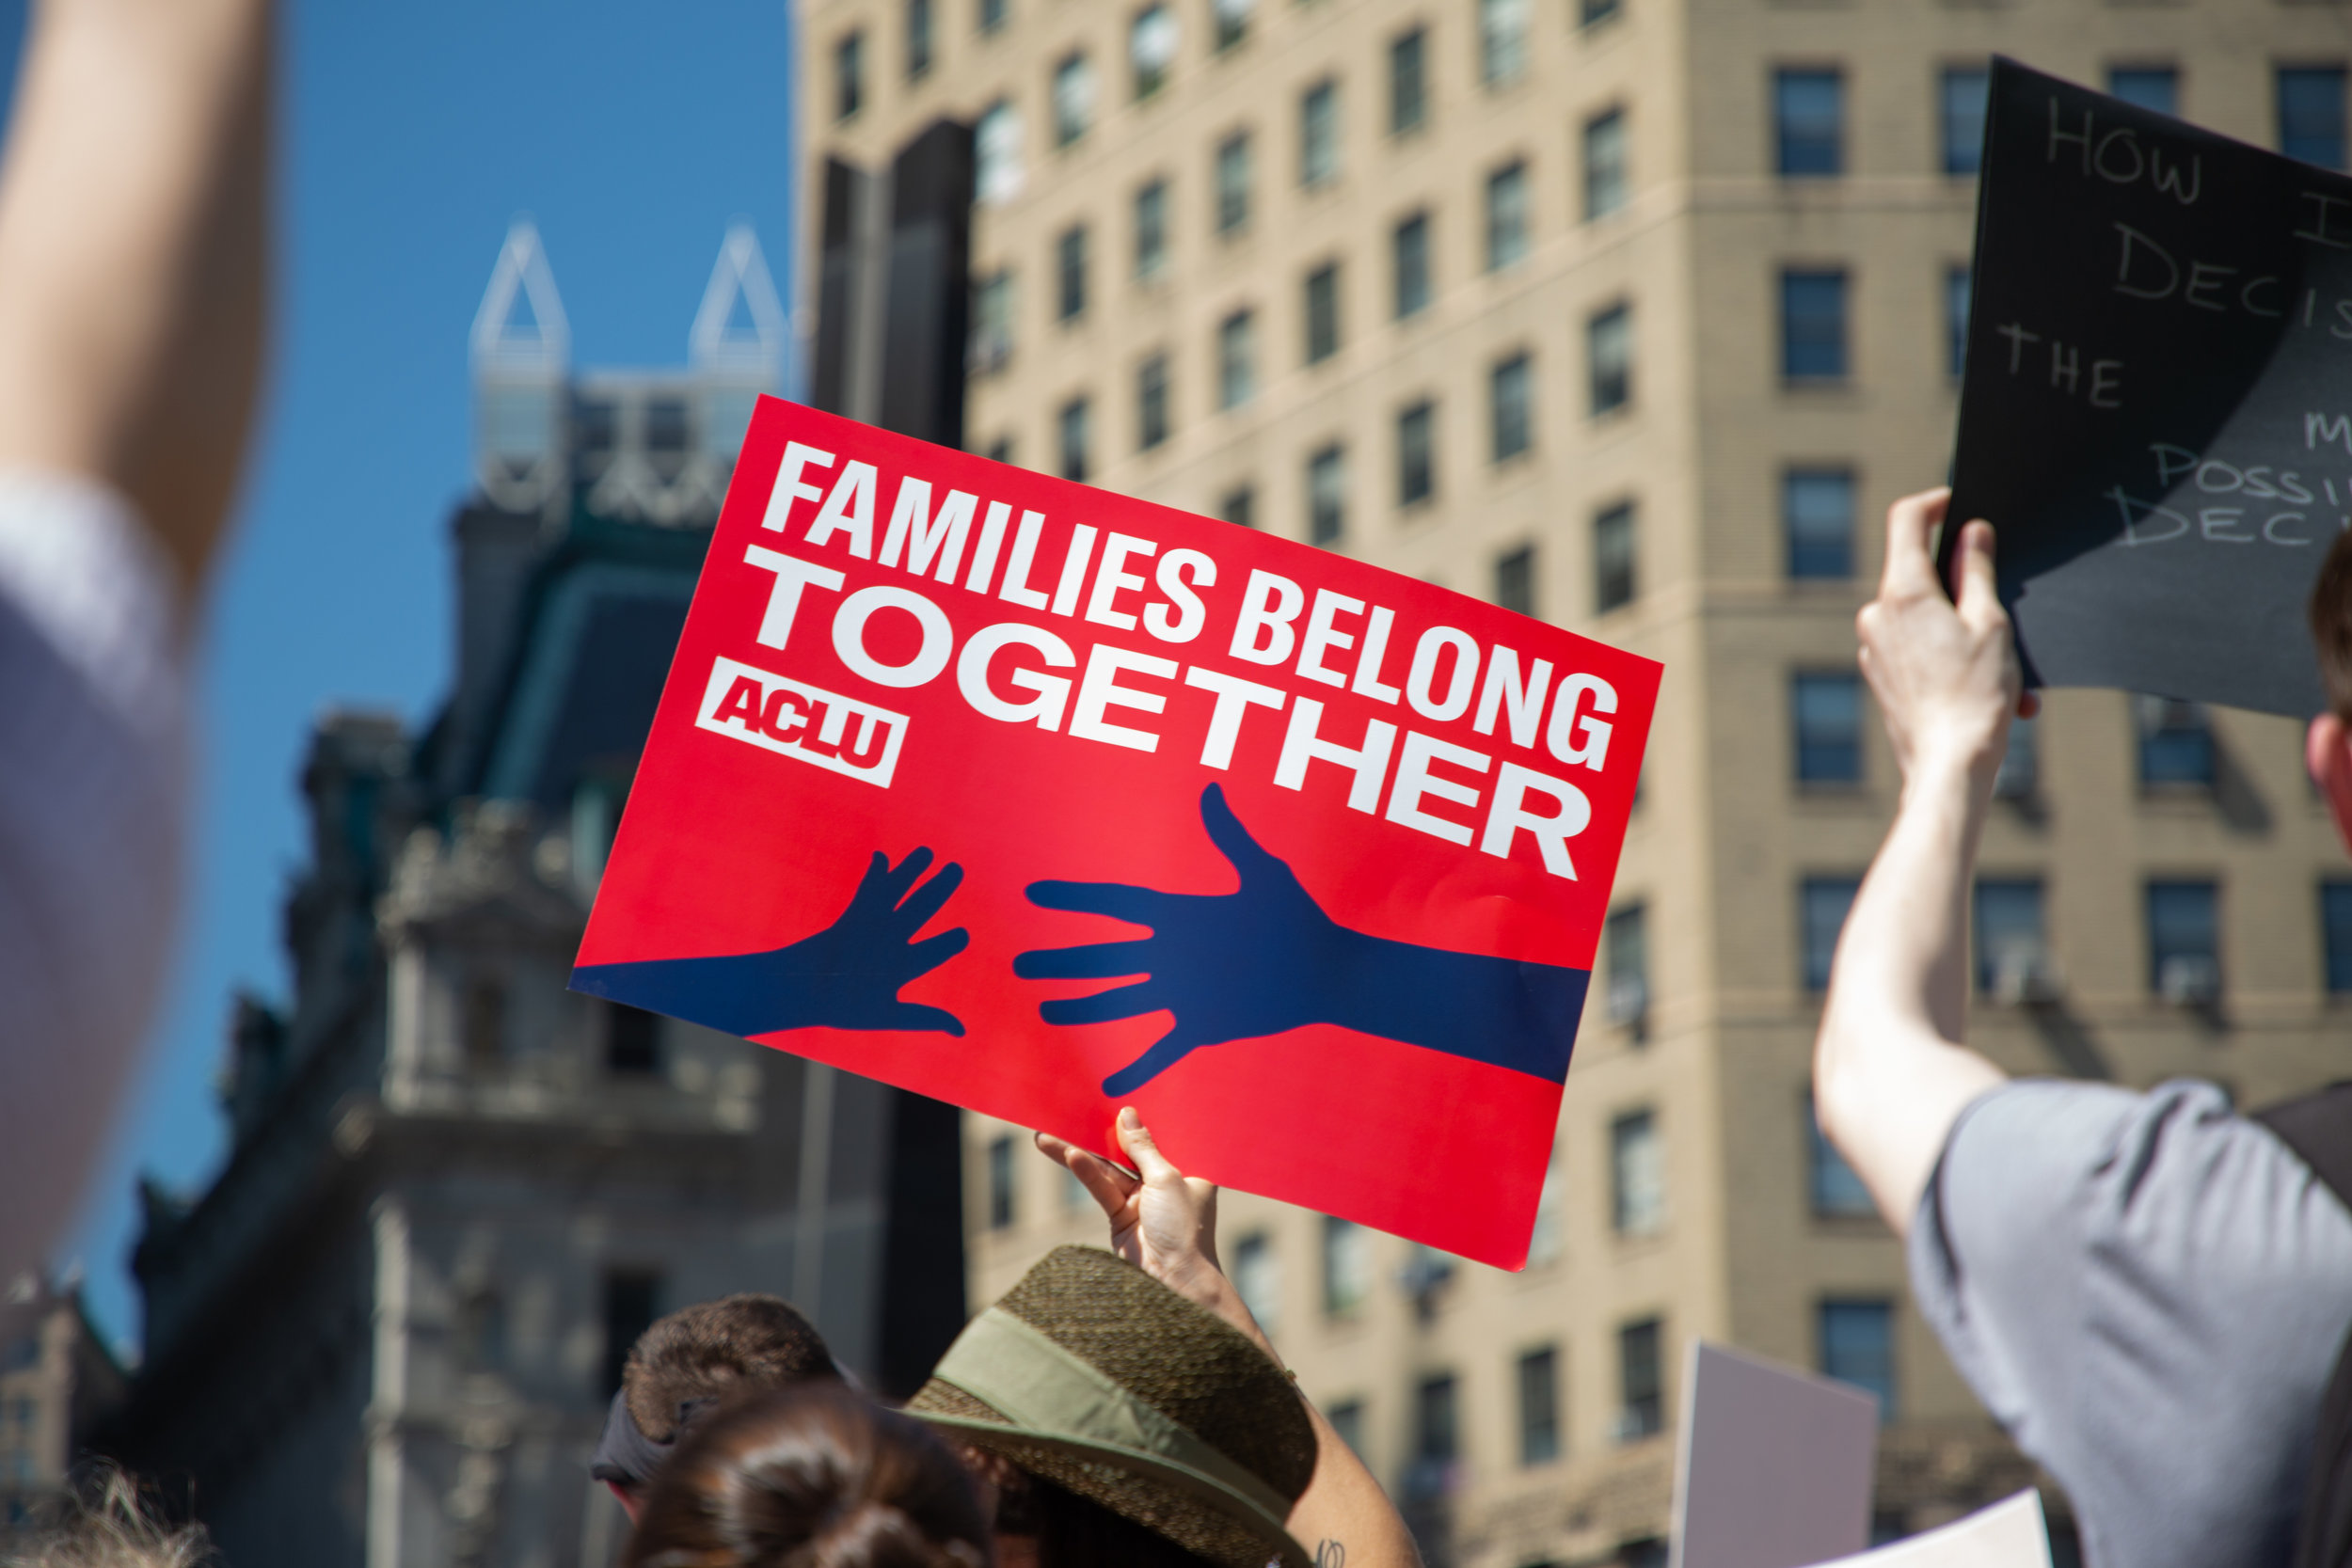 6.30.18_FamiliesBelongTogether_NYCLU-23.jpg